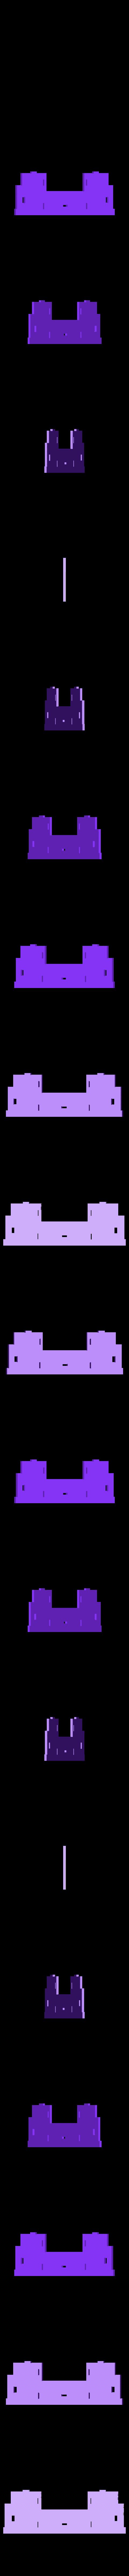 tube_long_center_support.stl Download free STL file OpenROV Underwater Robot • 3D printable design, PortoCruz675